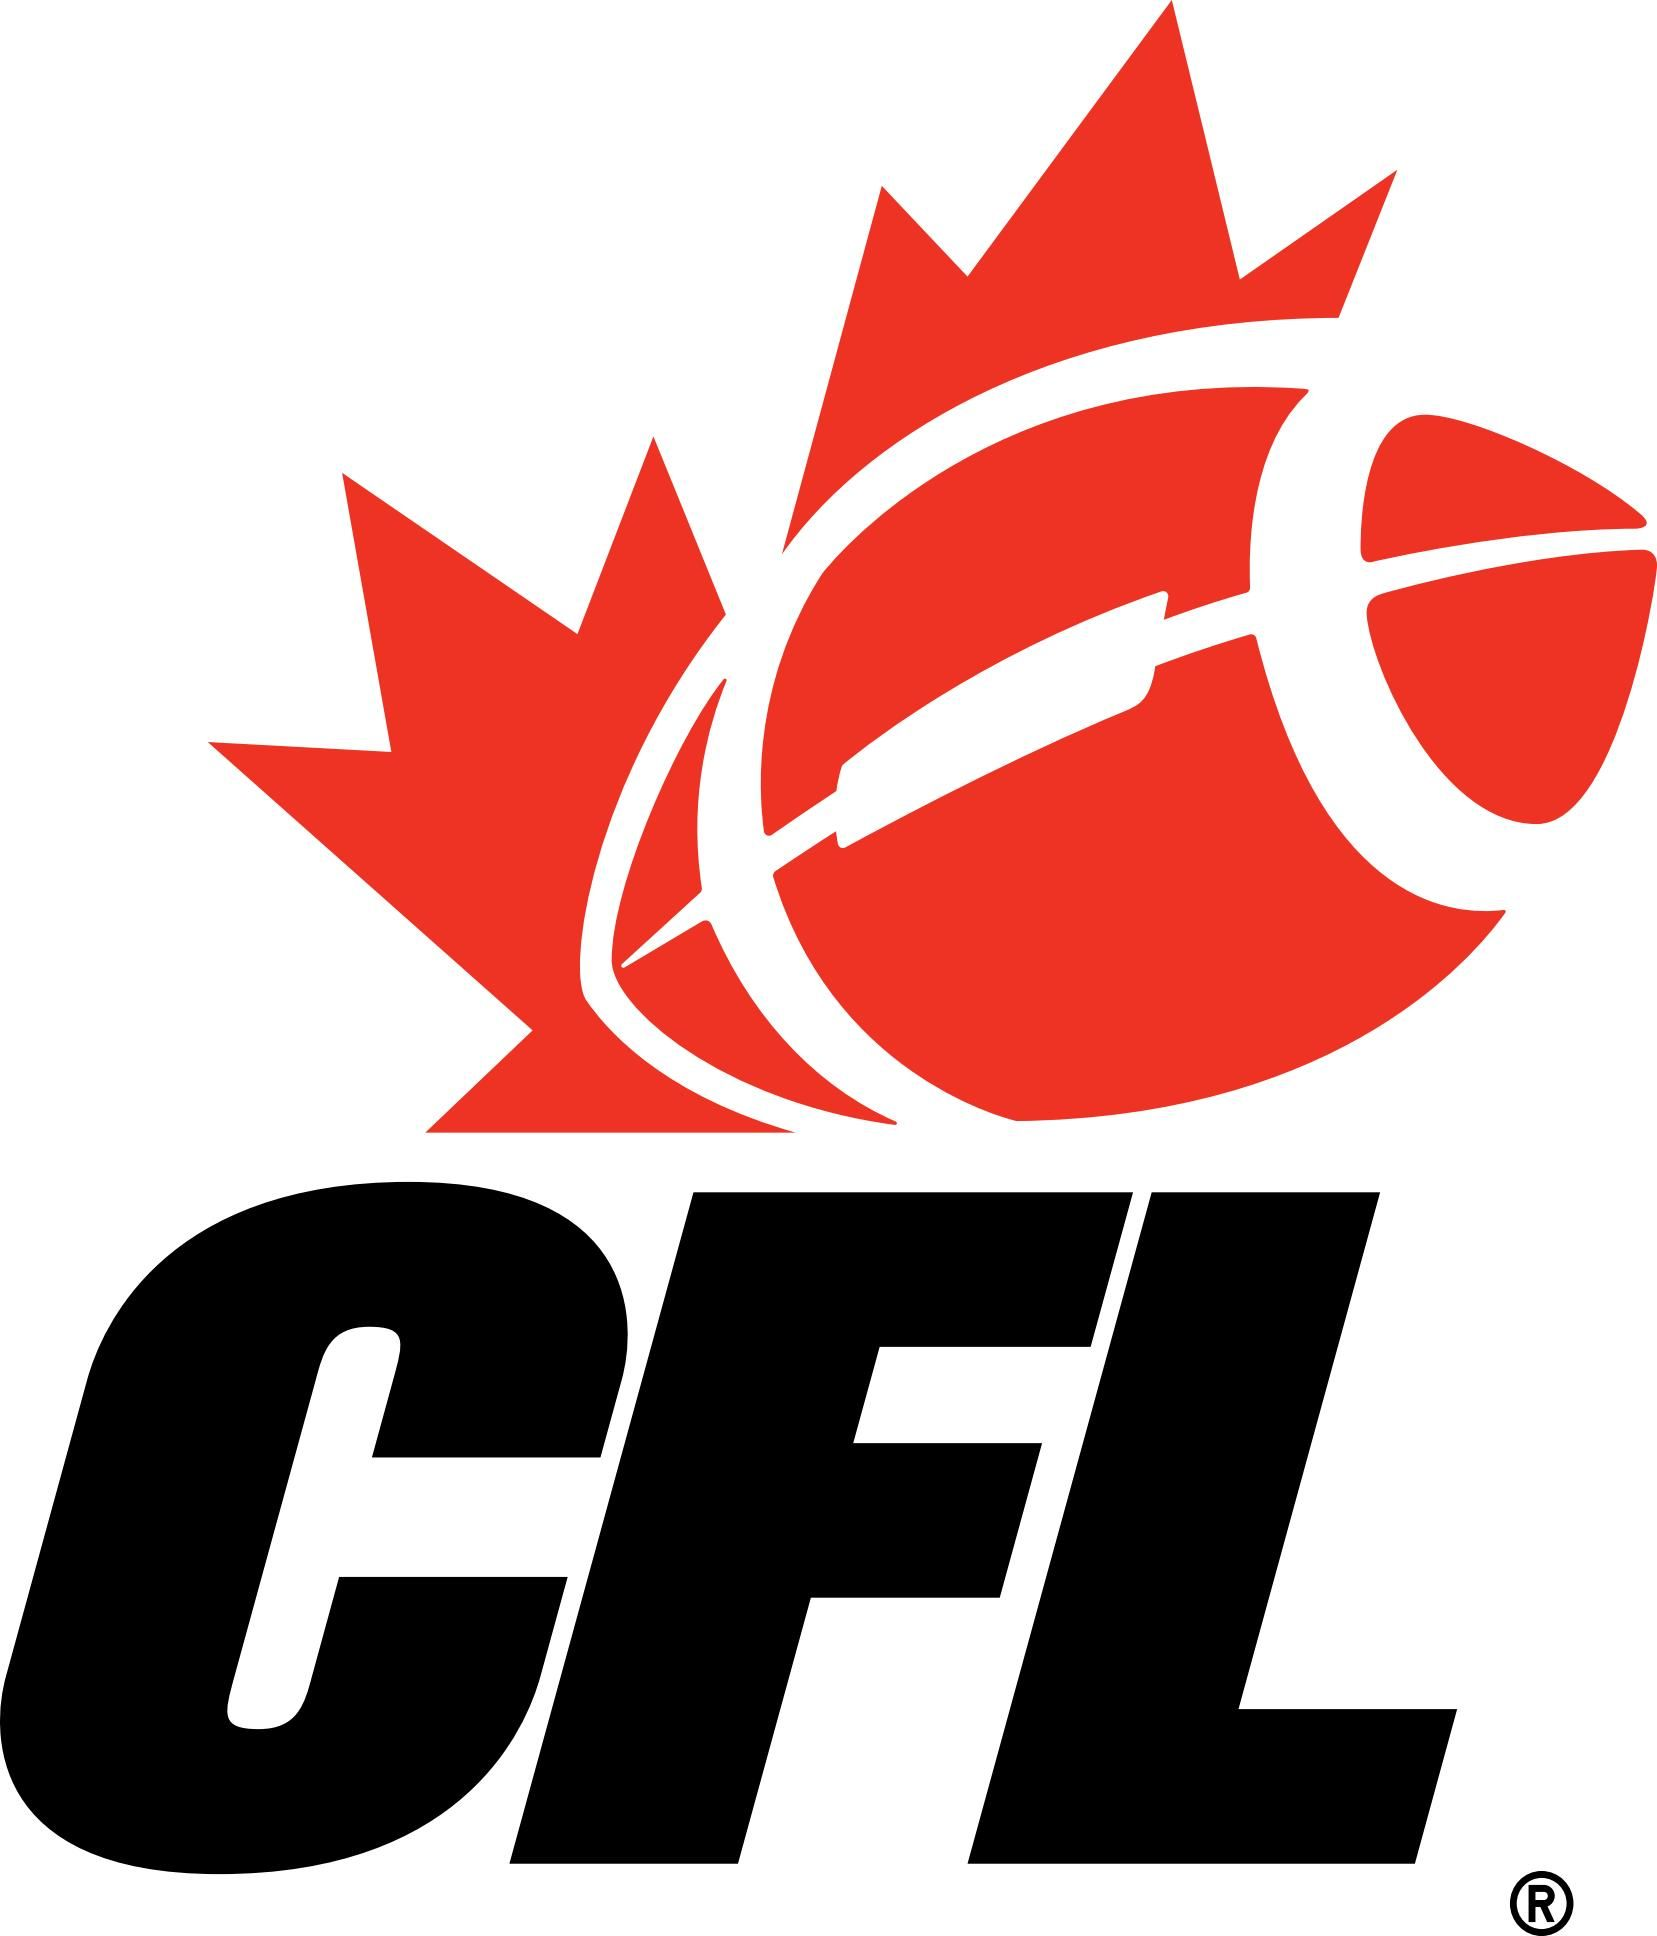 Cfl canadian football league logo eps file american